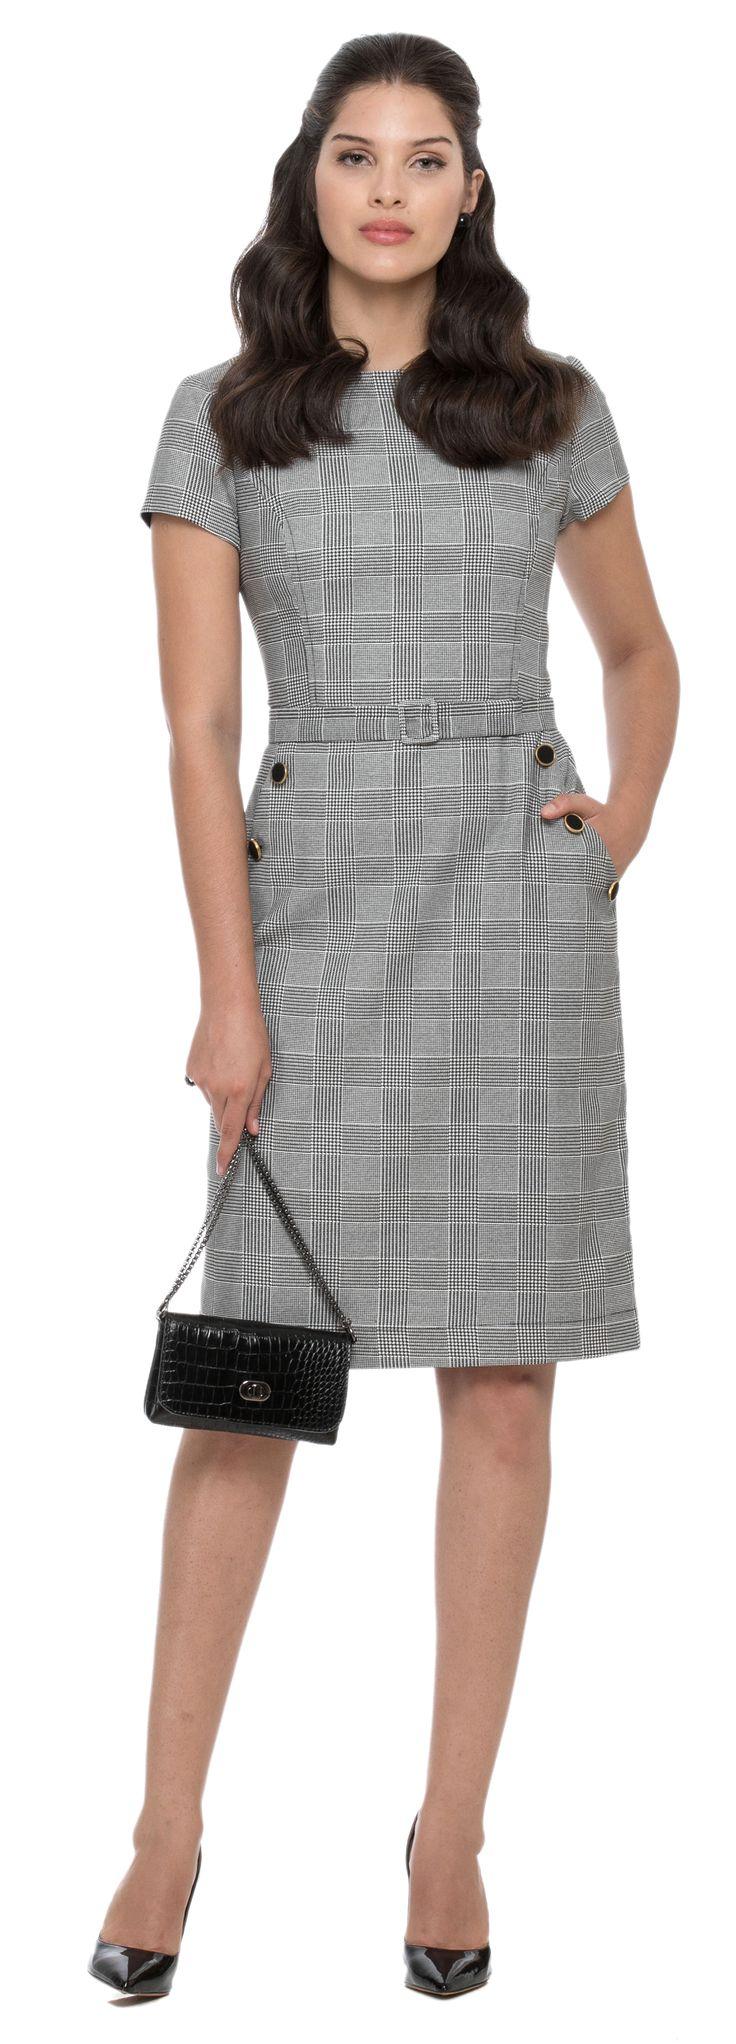 2635 best Kleider / dresses images on Pinterest | Fashion show ...